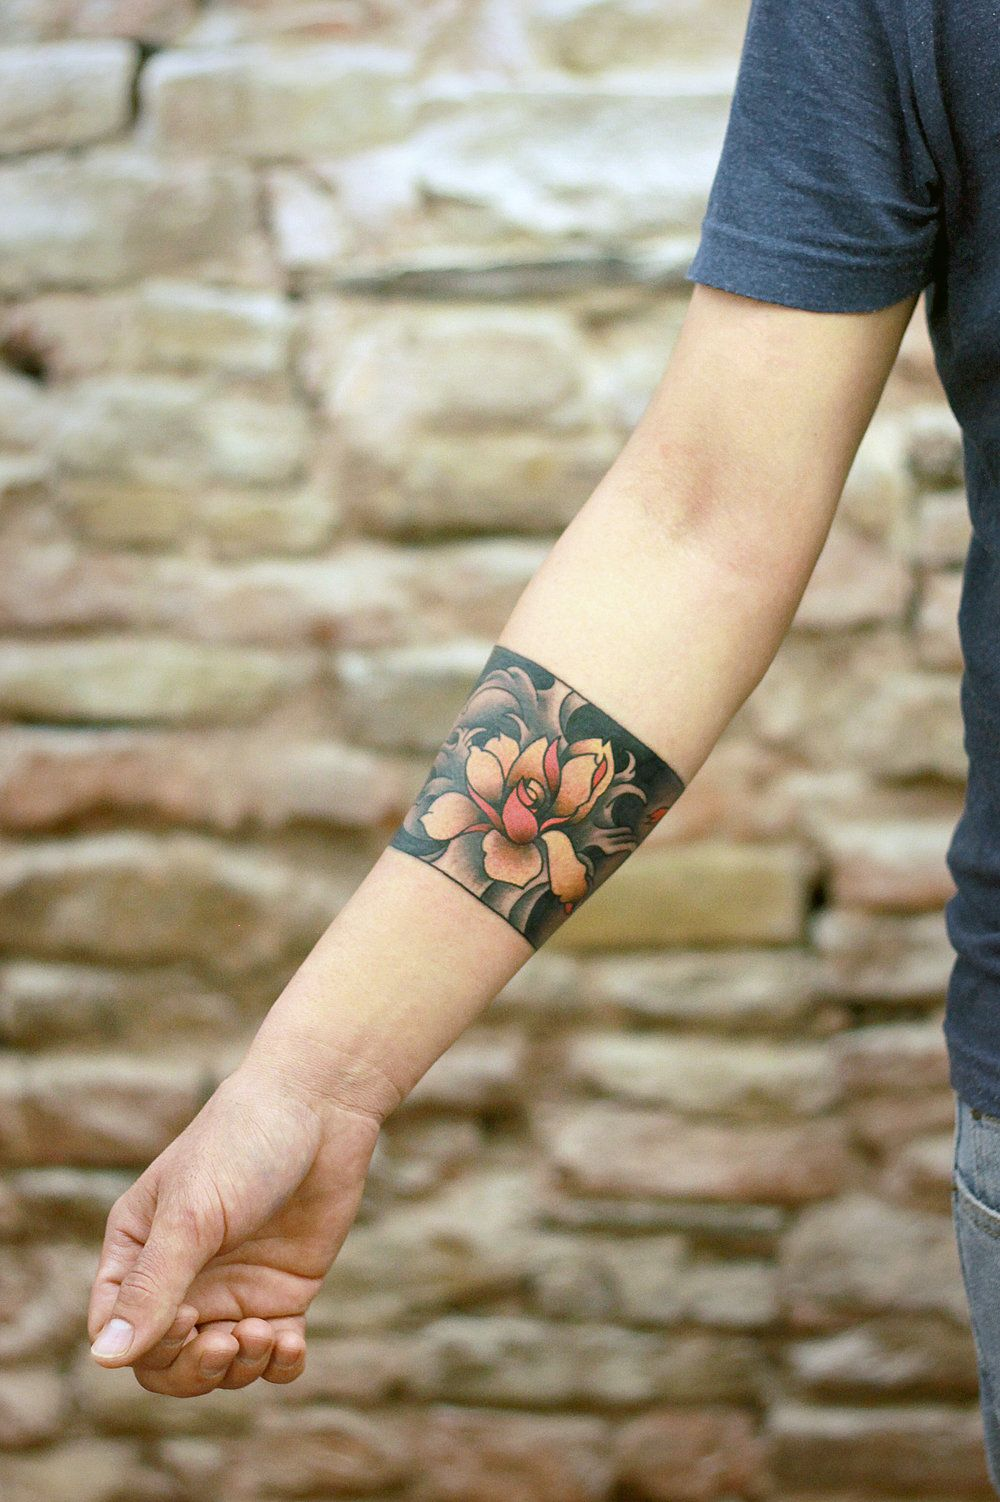 Gelang Lengan Forearm Band Tattoos Arm Band Tattoo For Women Wrist Band Tattoo